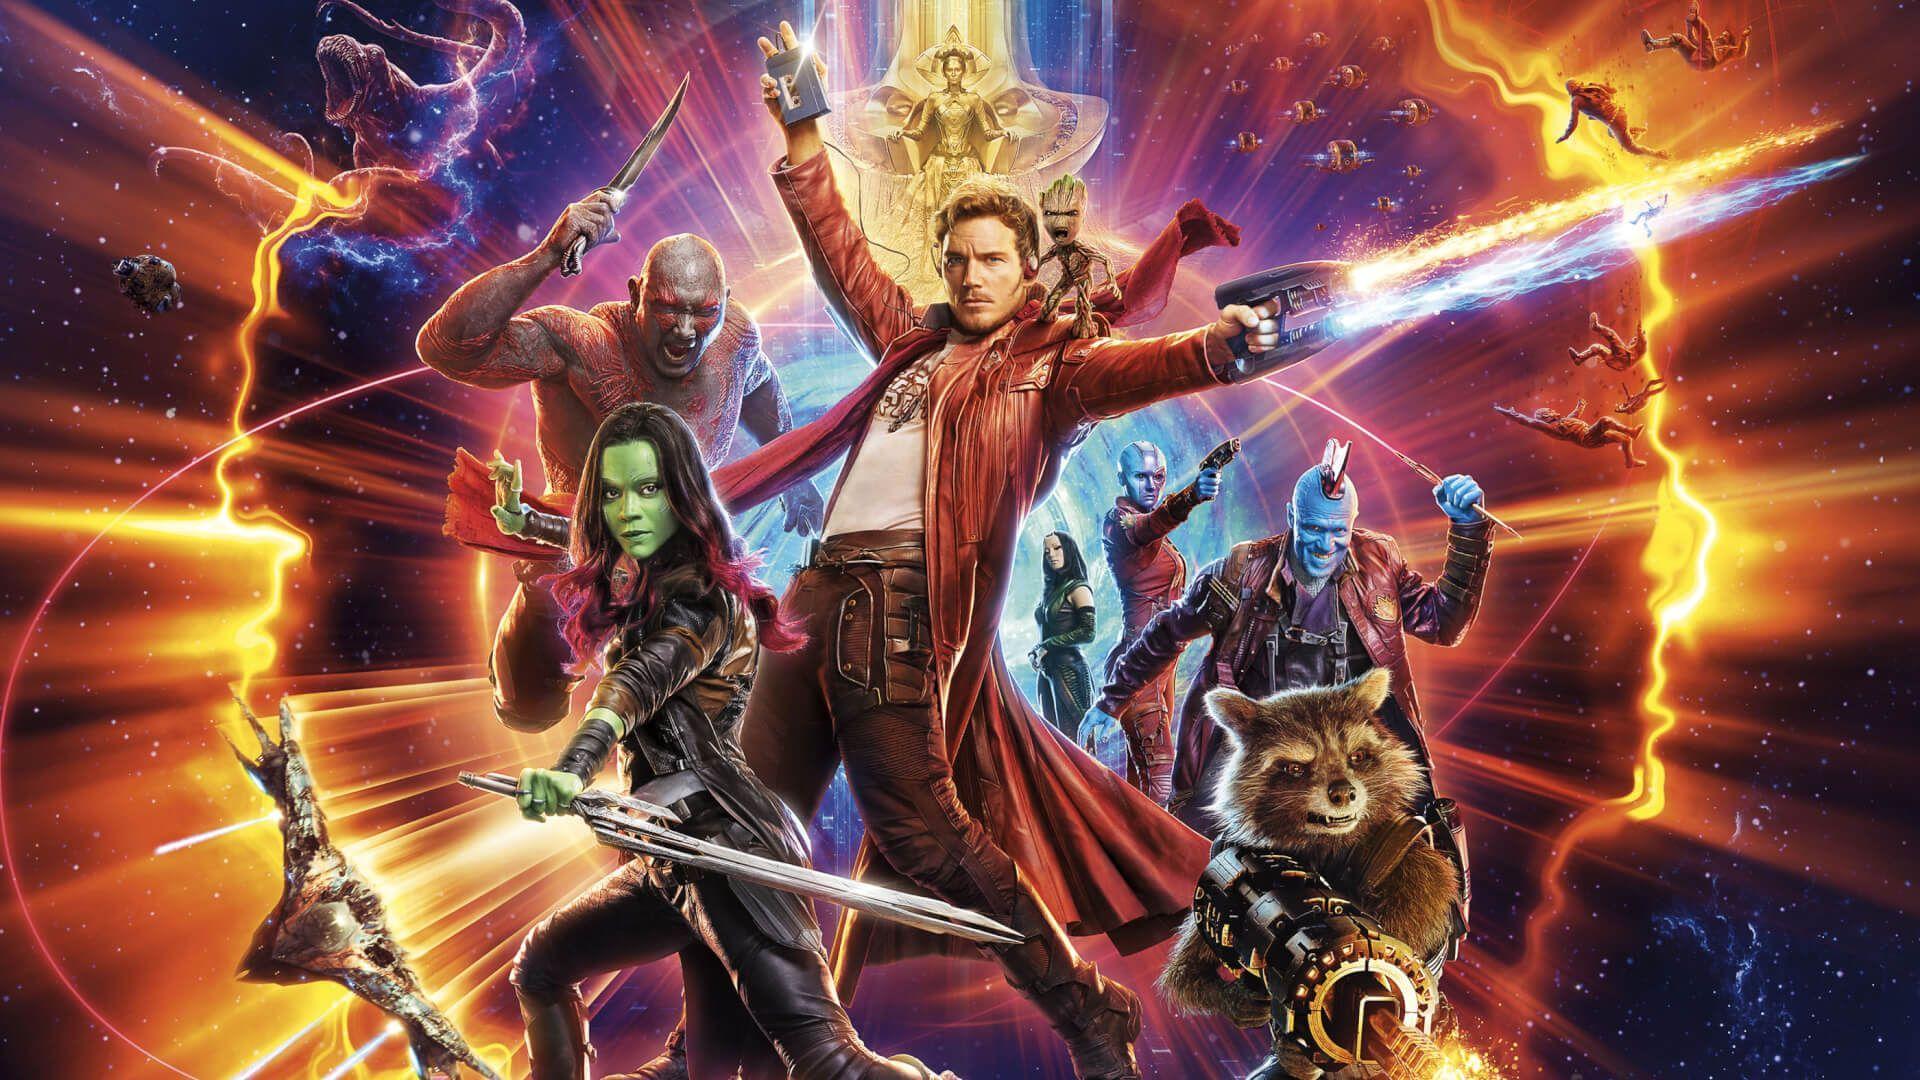 Pin On Marvel Movies